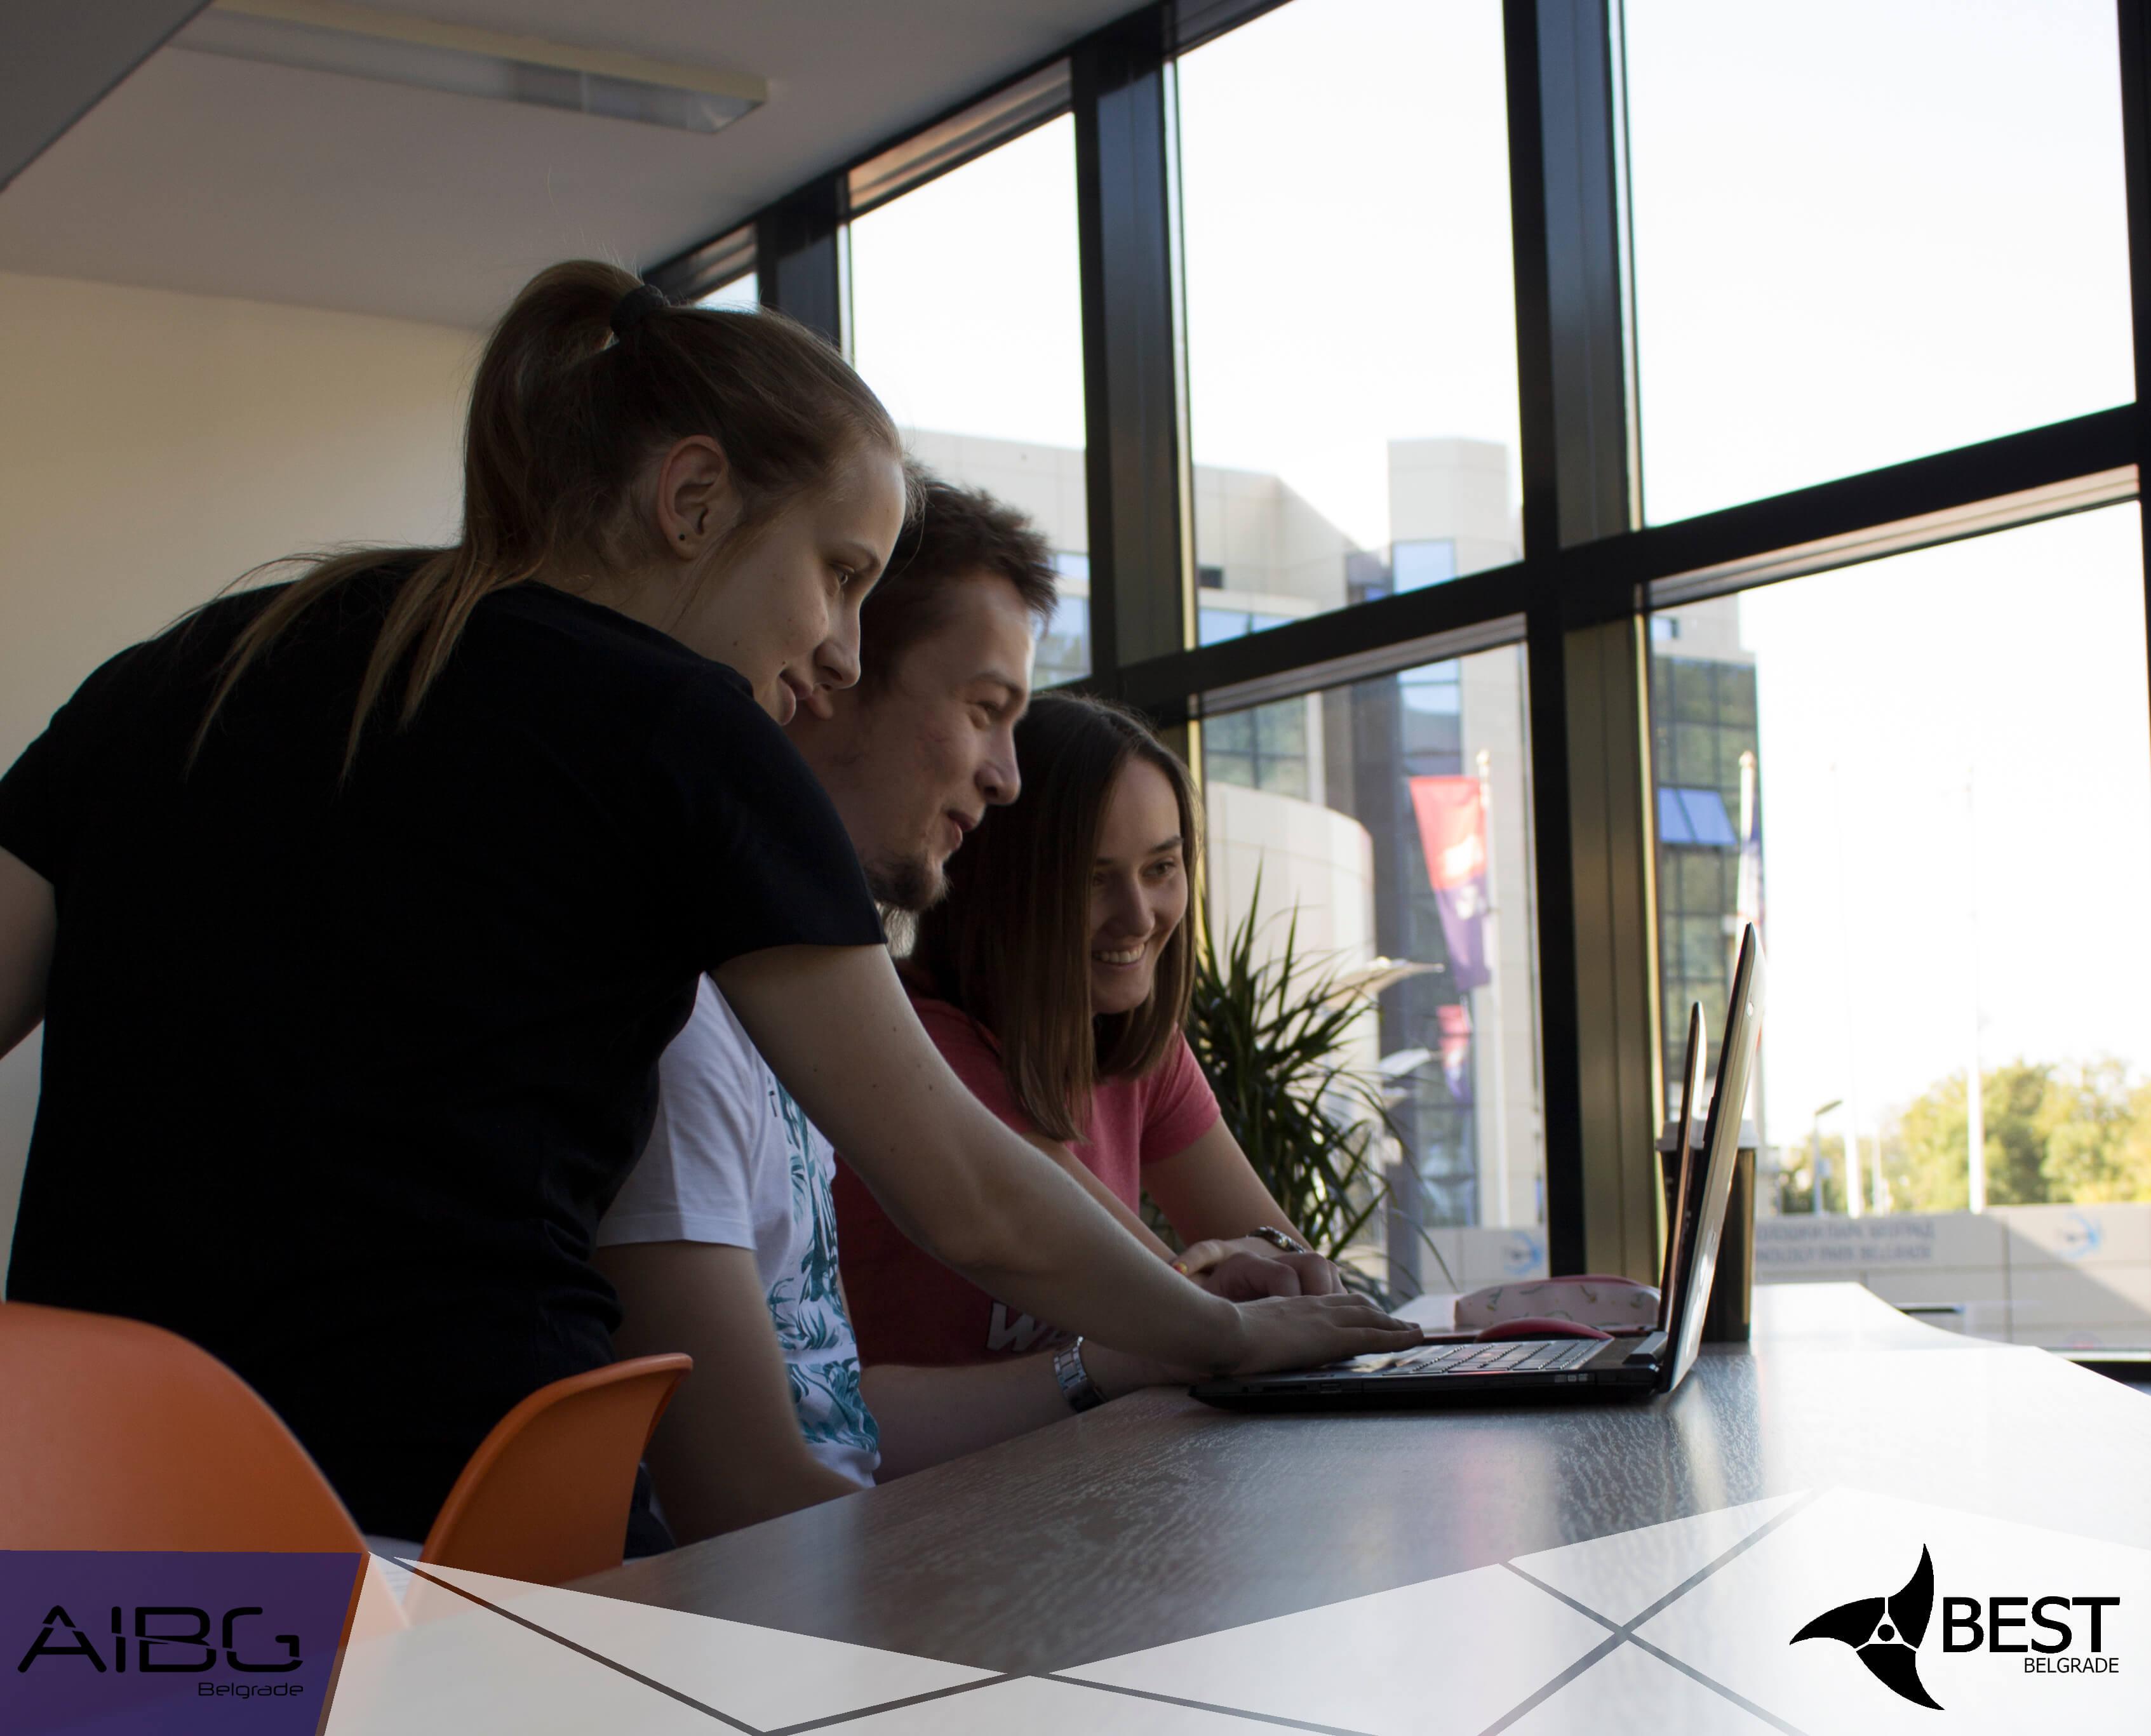 otvorene prijave artificial intelligence battleground aibg 2018 belgrade beograd